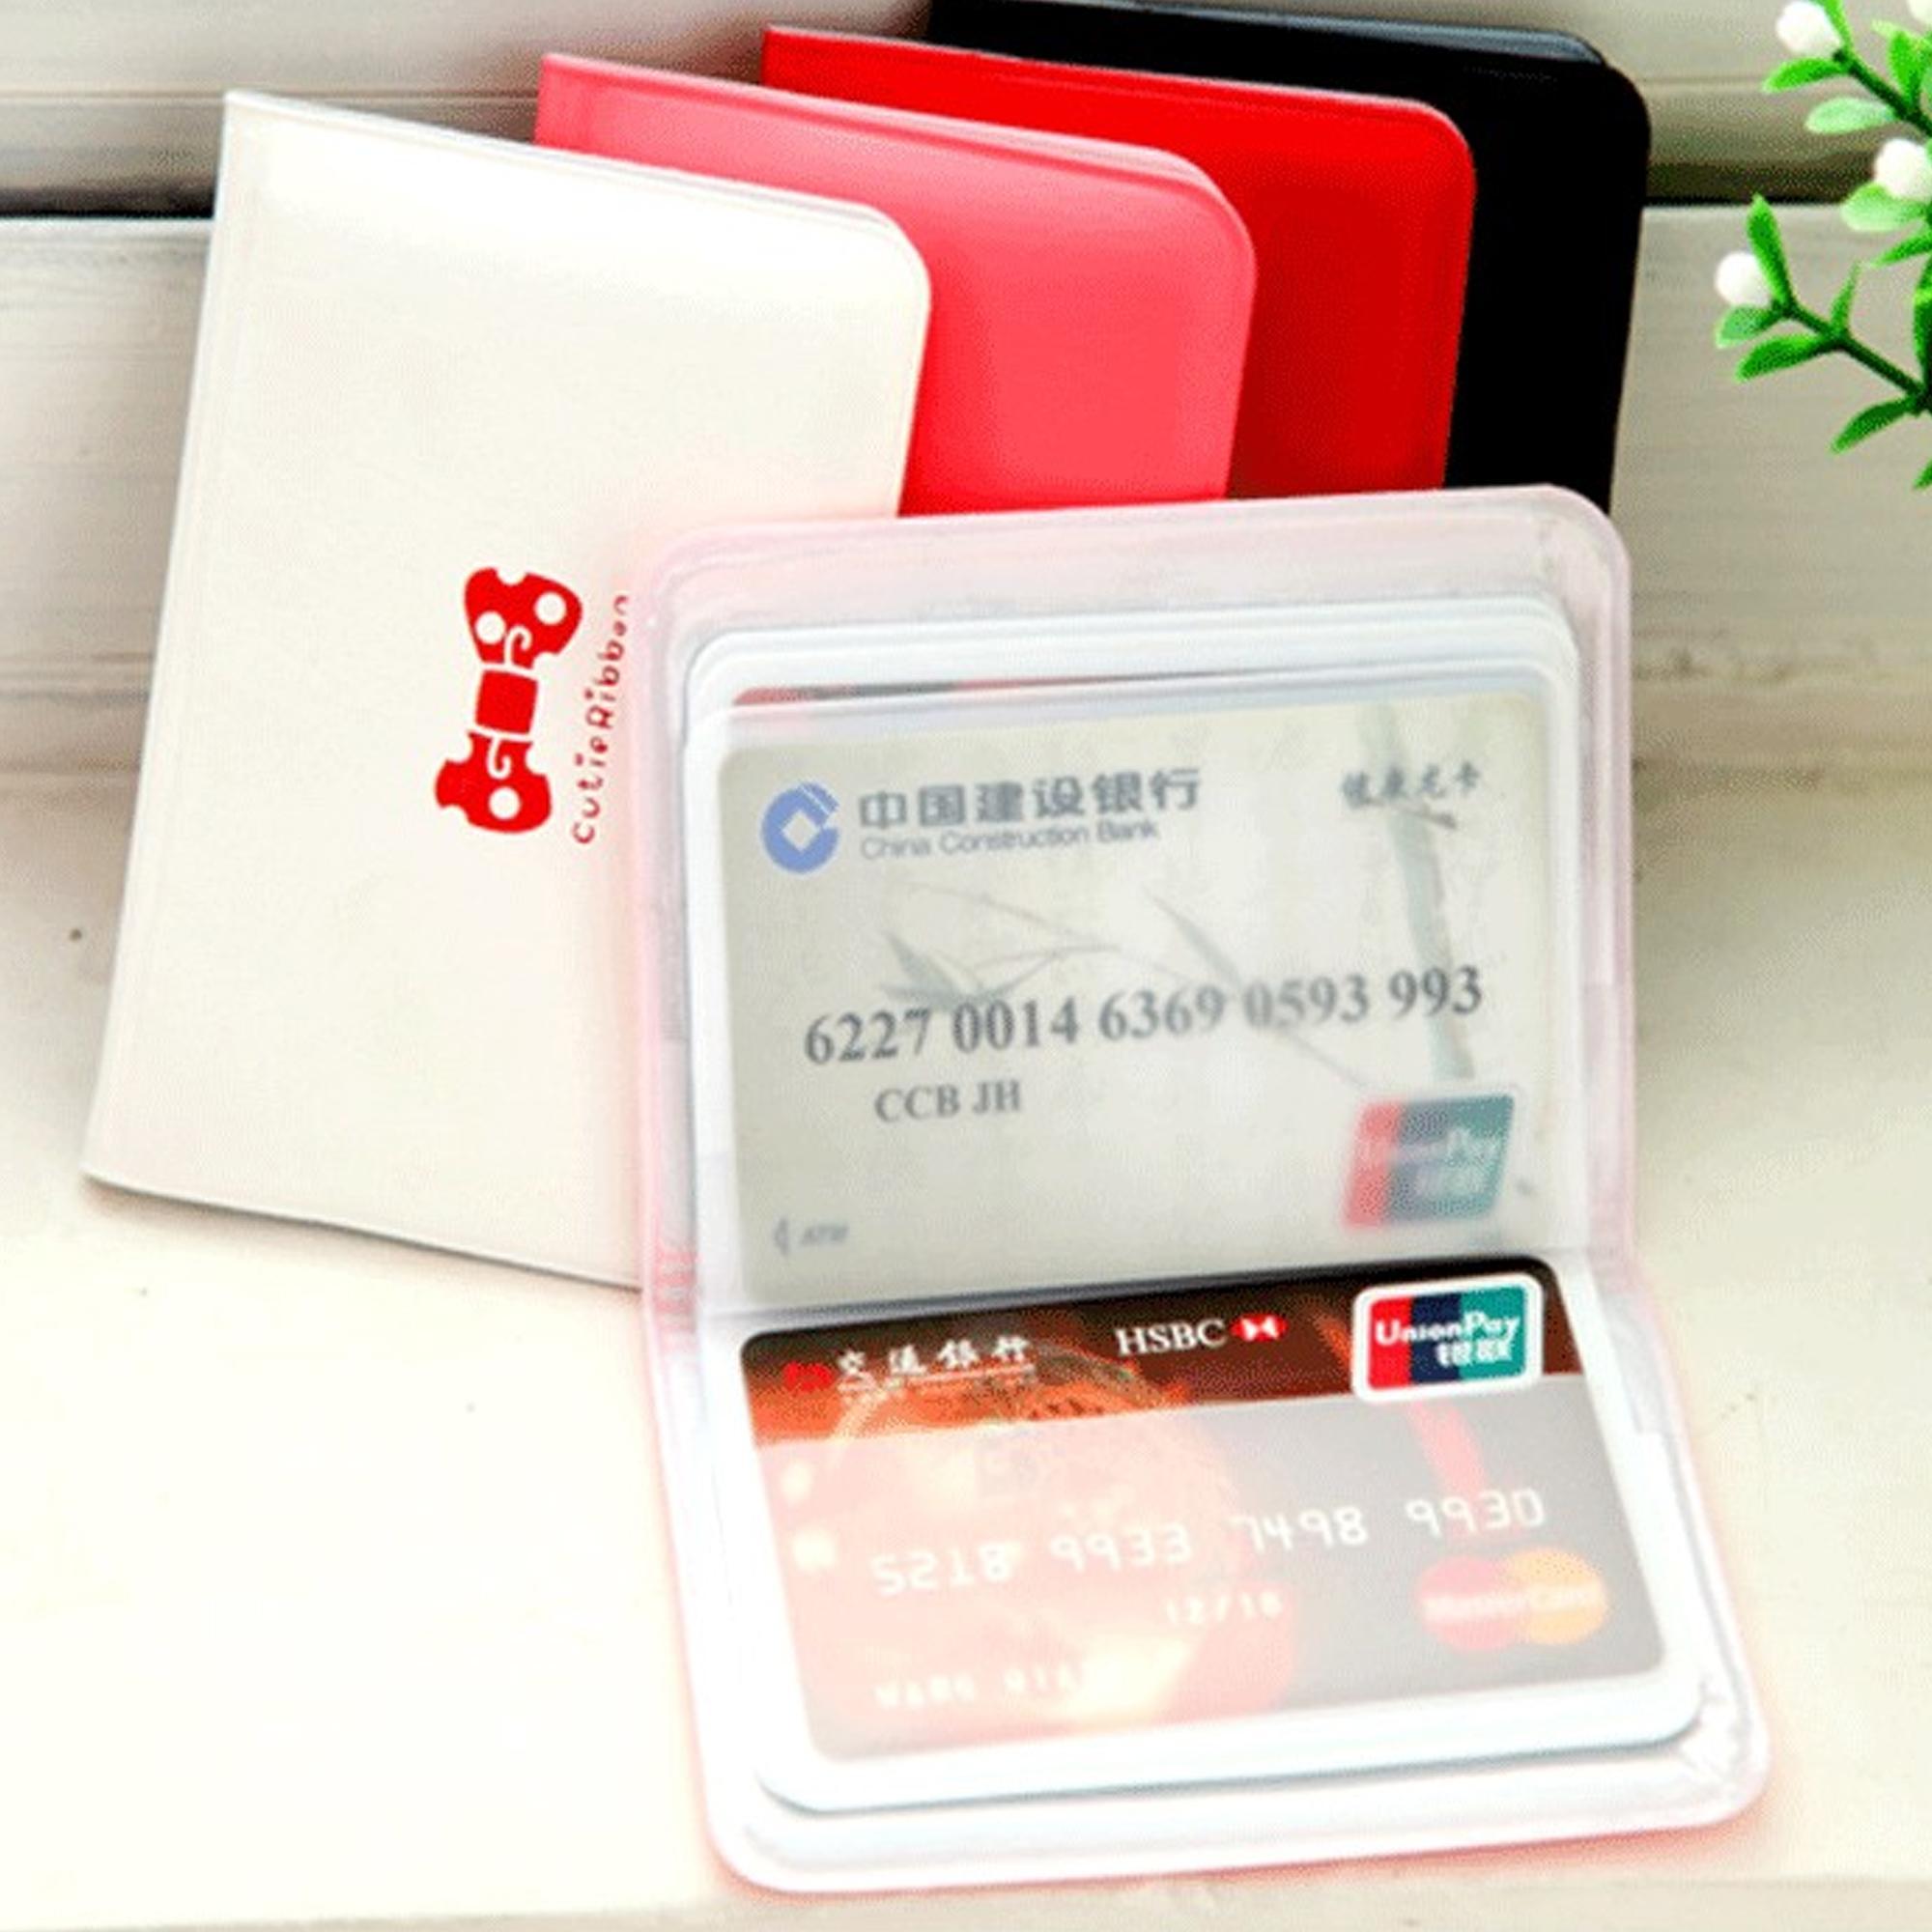 e2d013bc2841 Unisex Card Holders for sale - Unisex Travel Card Holders online ...